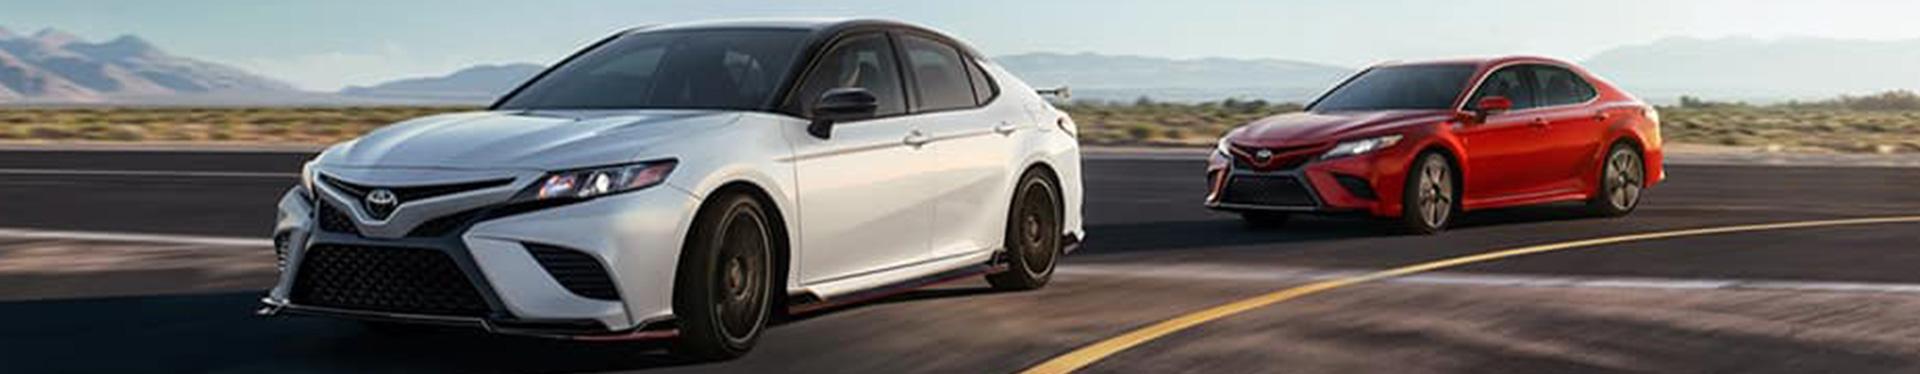 Toyota Certified Collision Repair